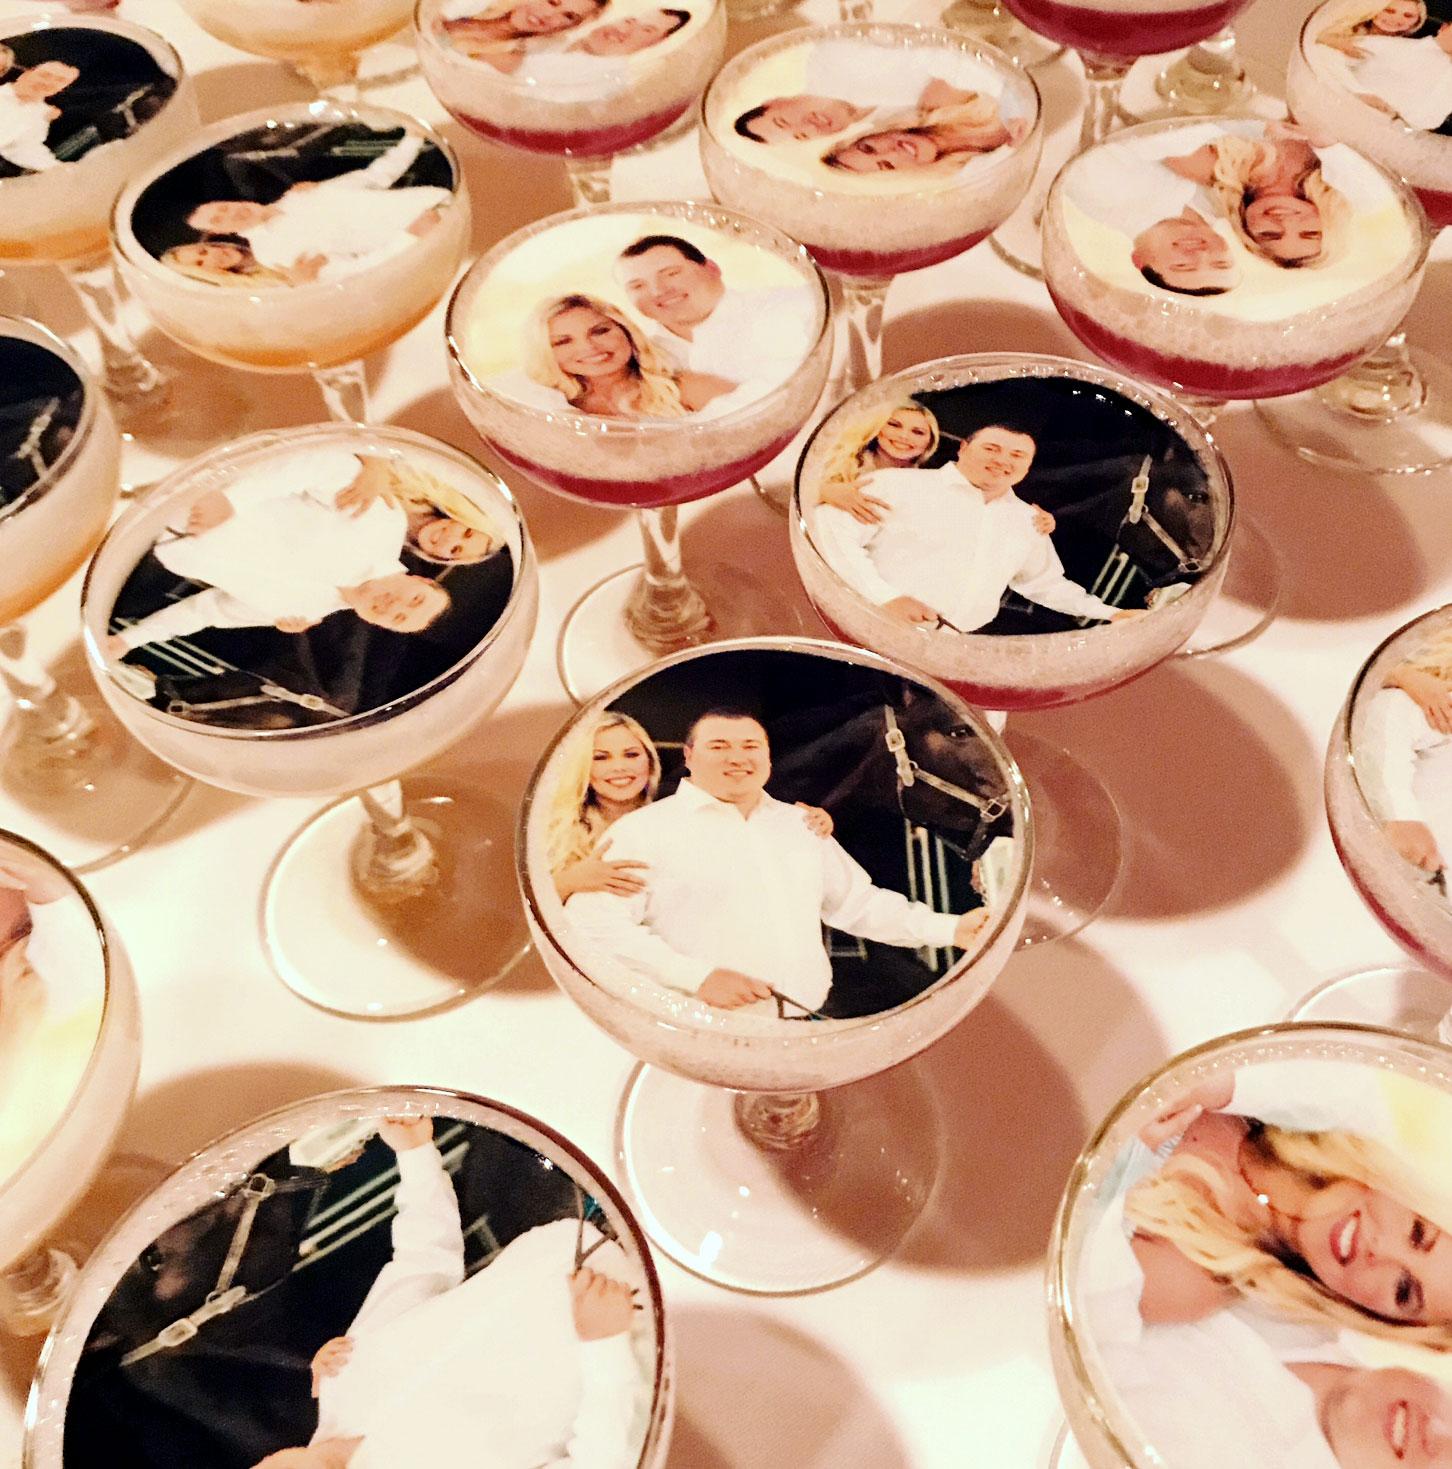 Wedding Drink Pictures